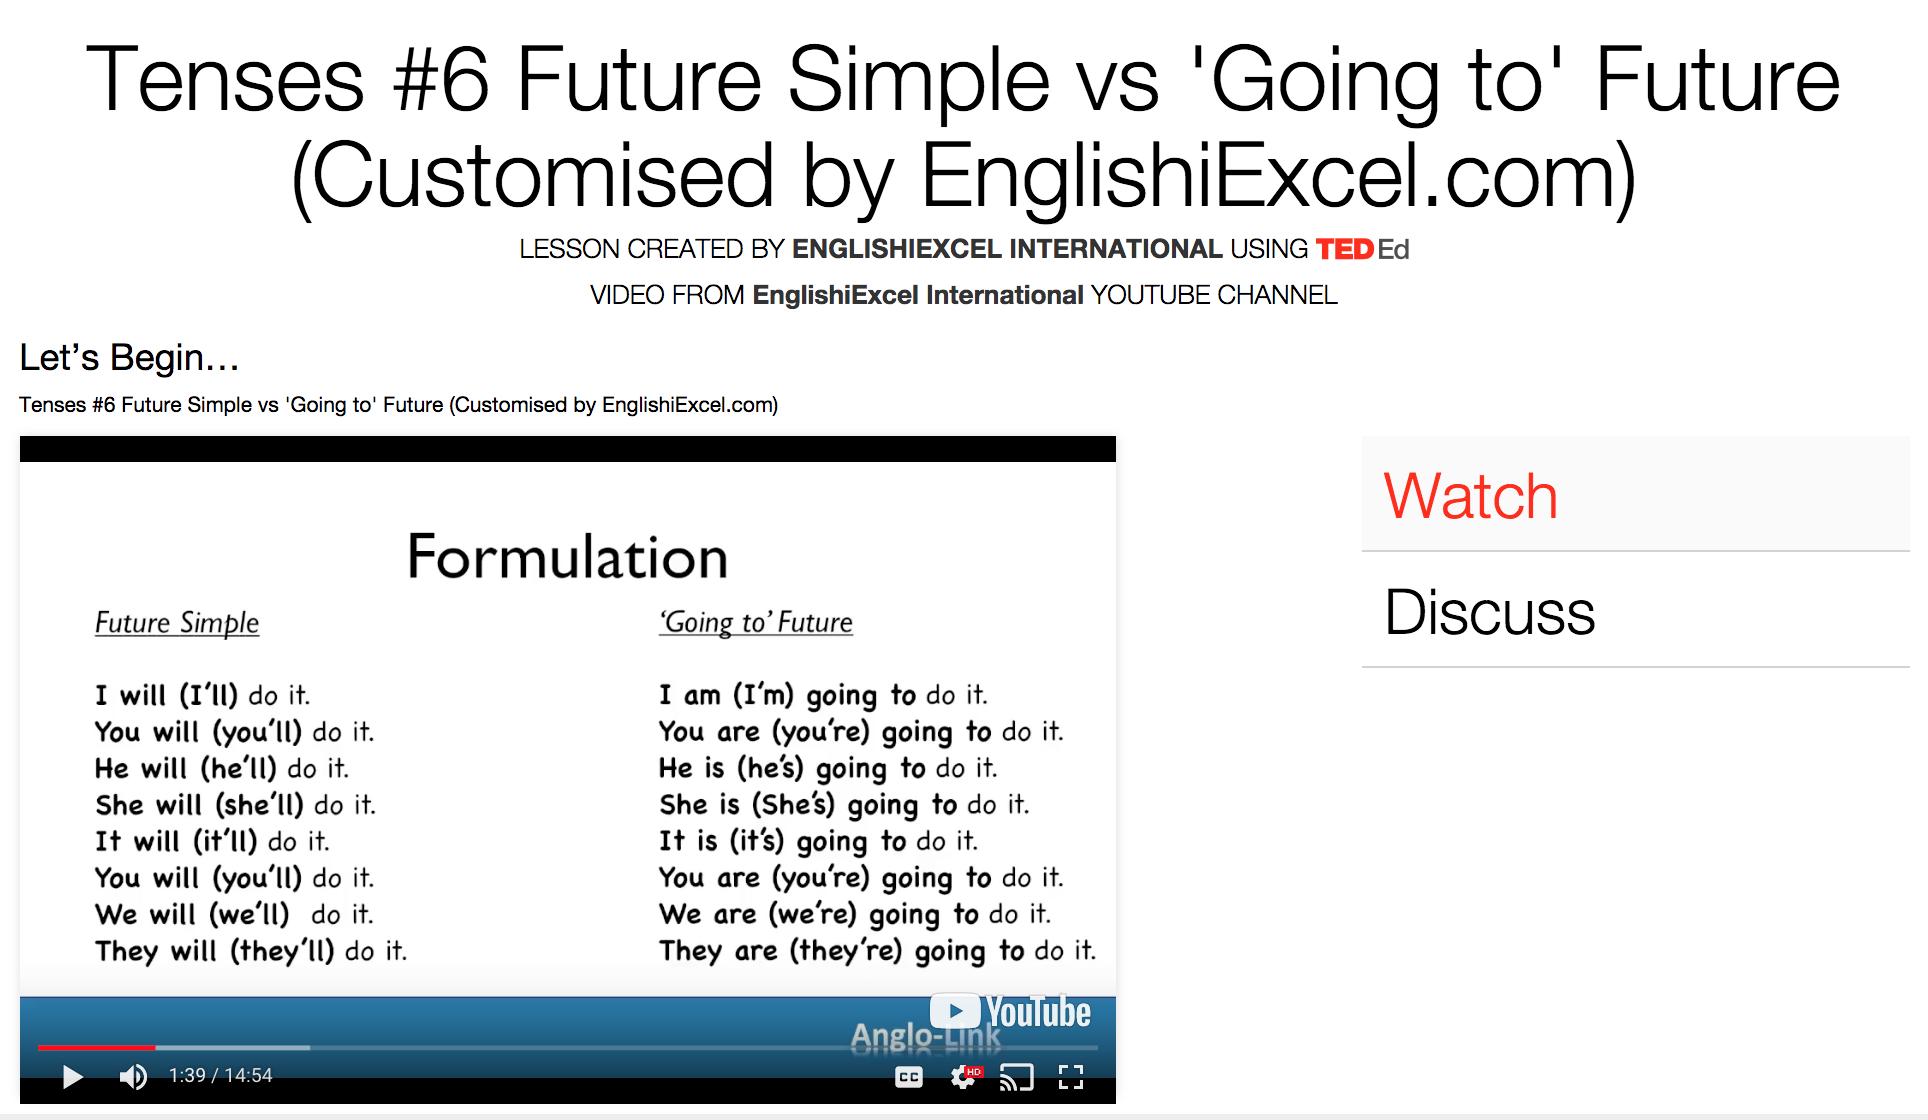 Unit 11: Tenses #6 - Future Simple vs 'Going To' Future